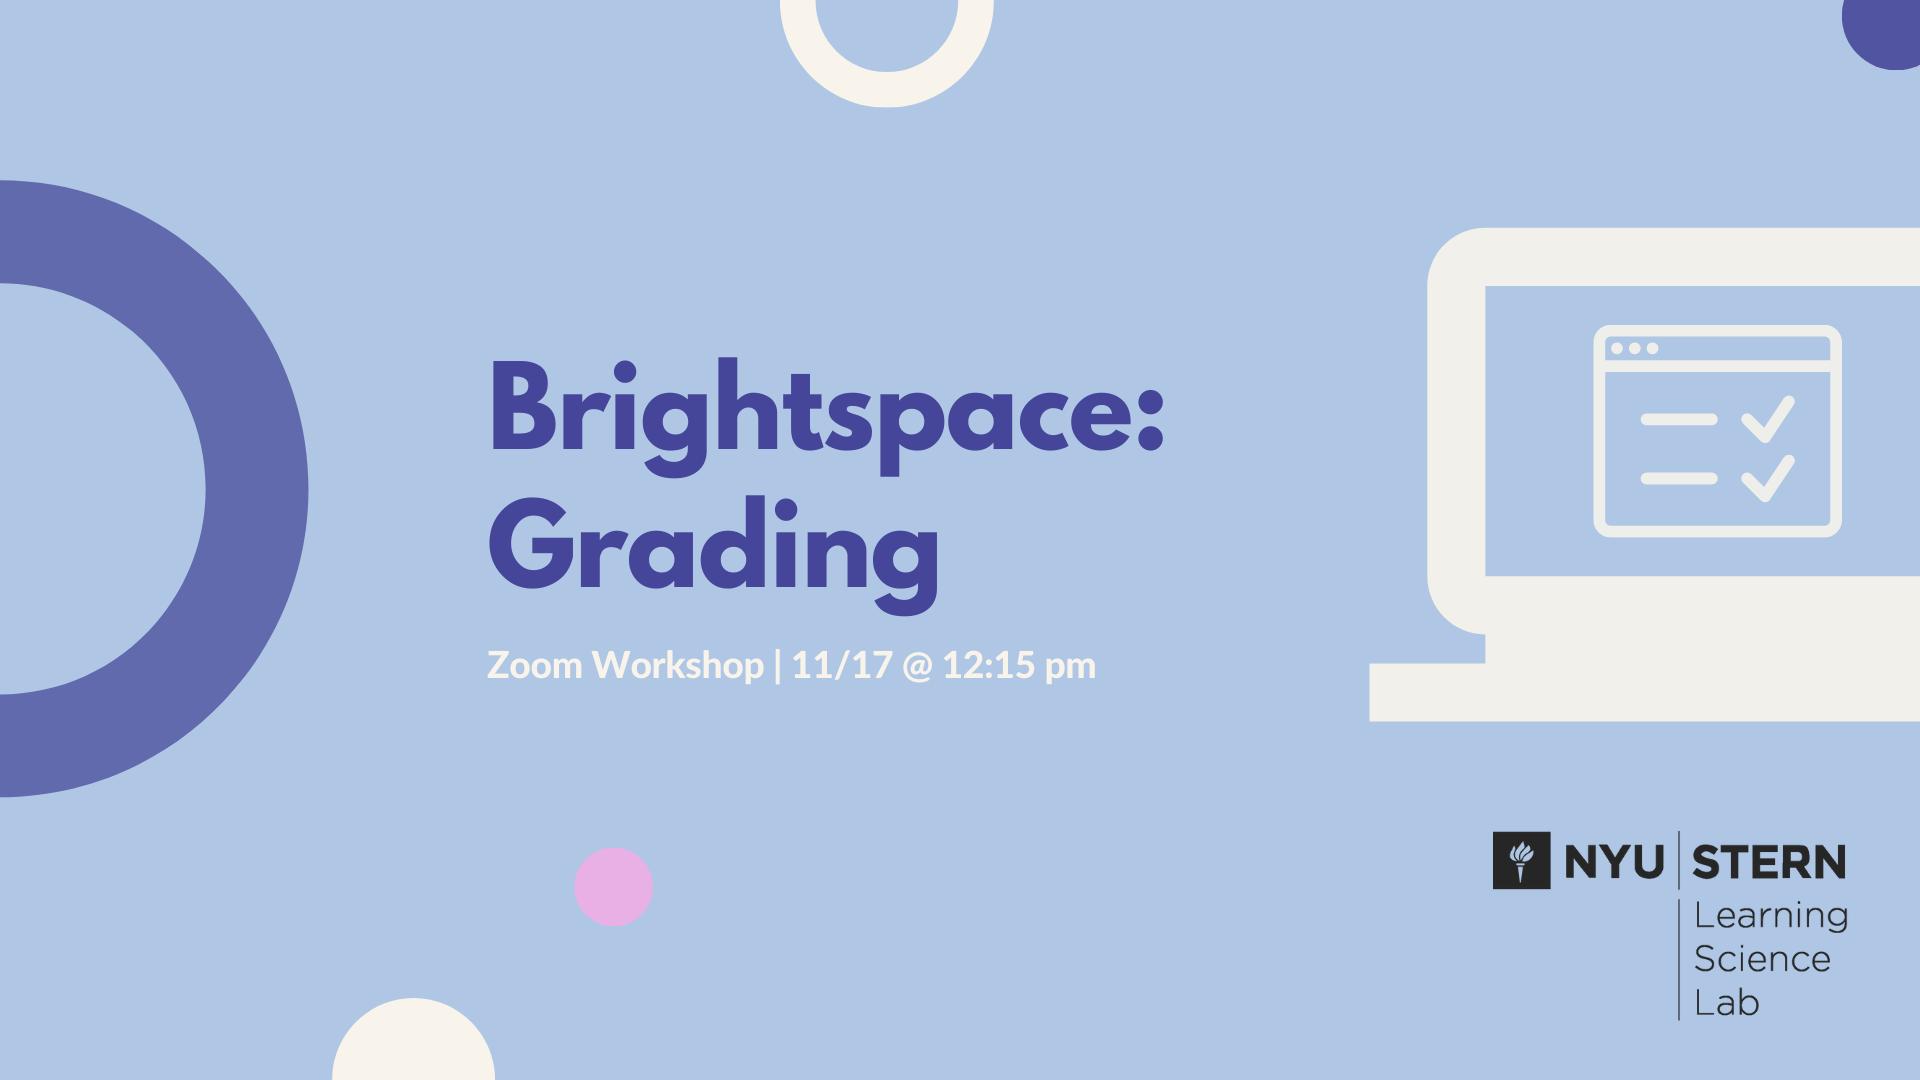 Brightspace Grading